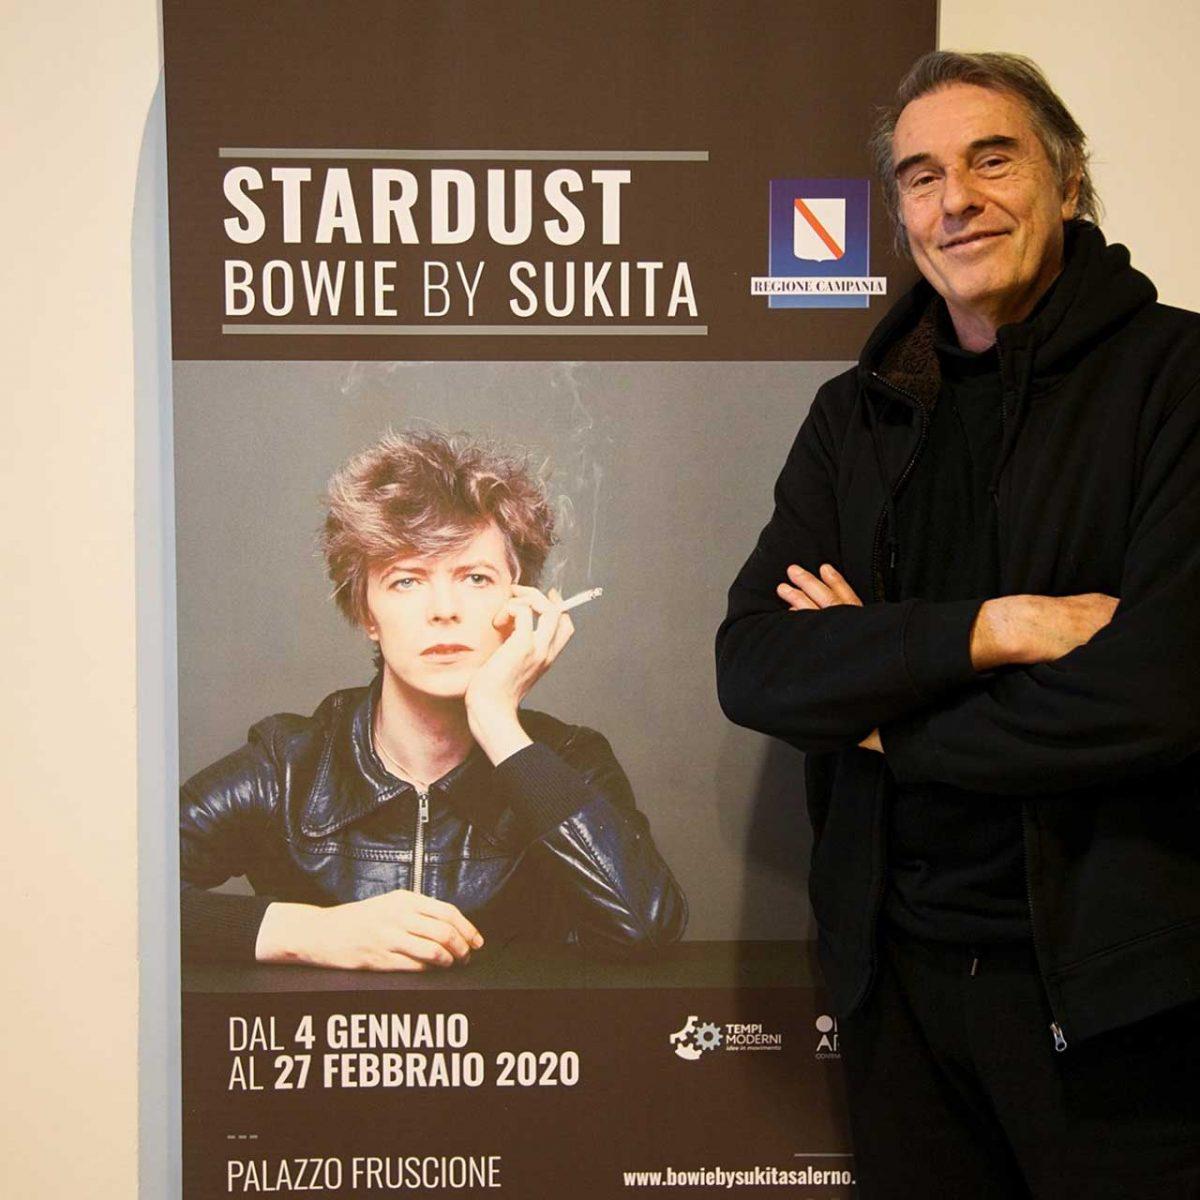 Carlo Massarini - Bowie to Bowie